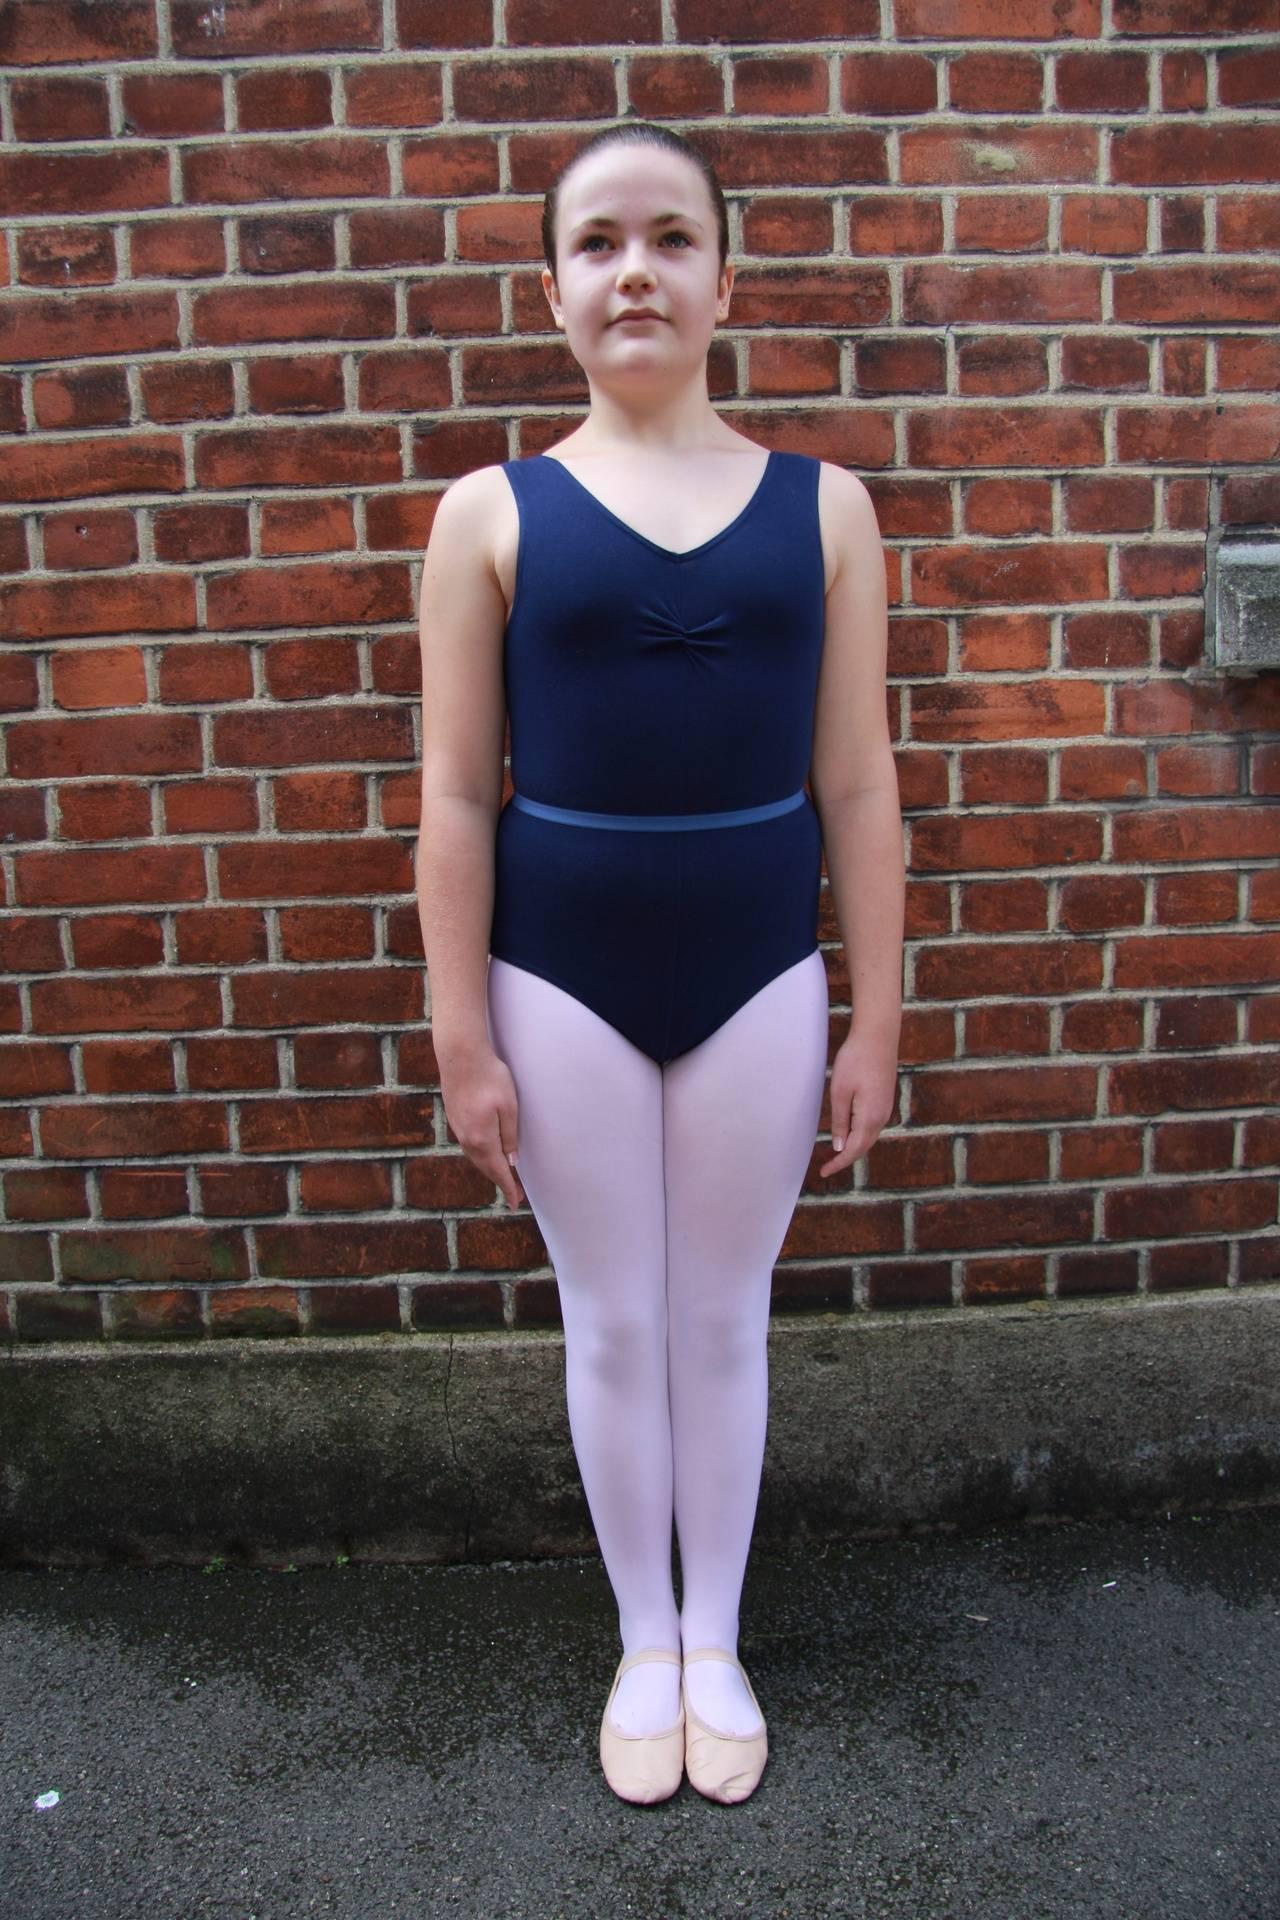 Grade 4 girls classical uniform for girls